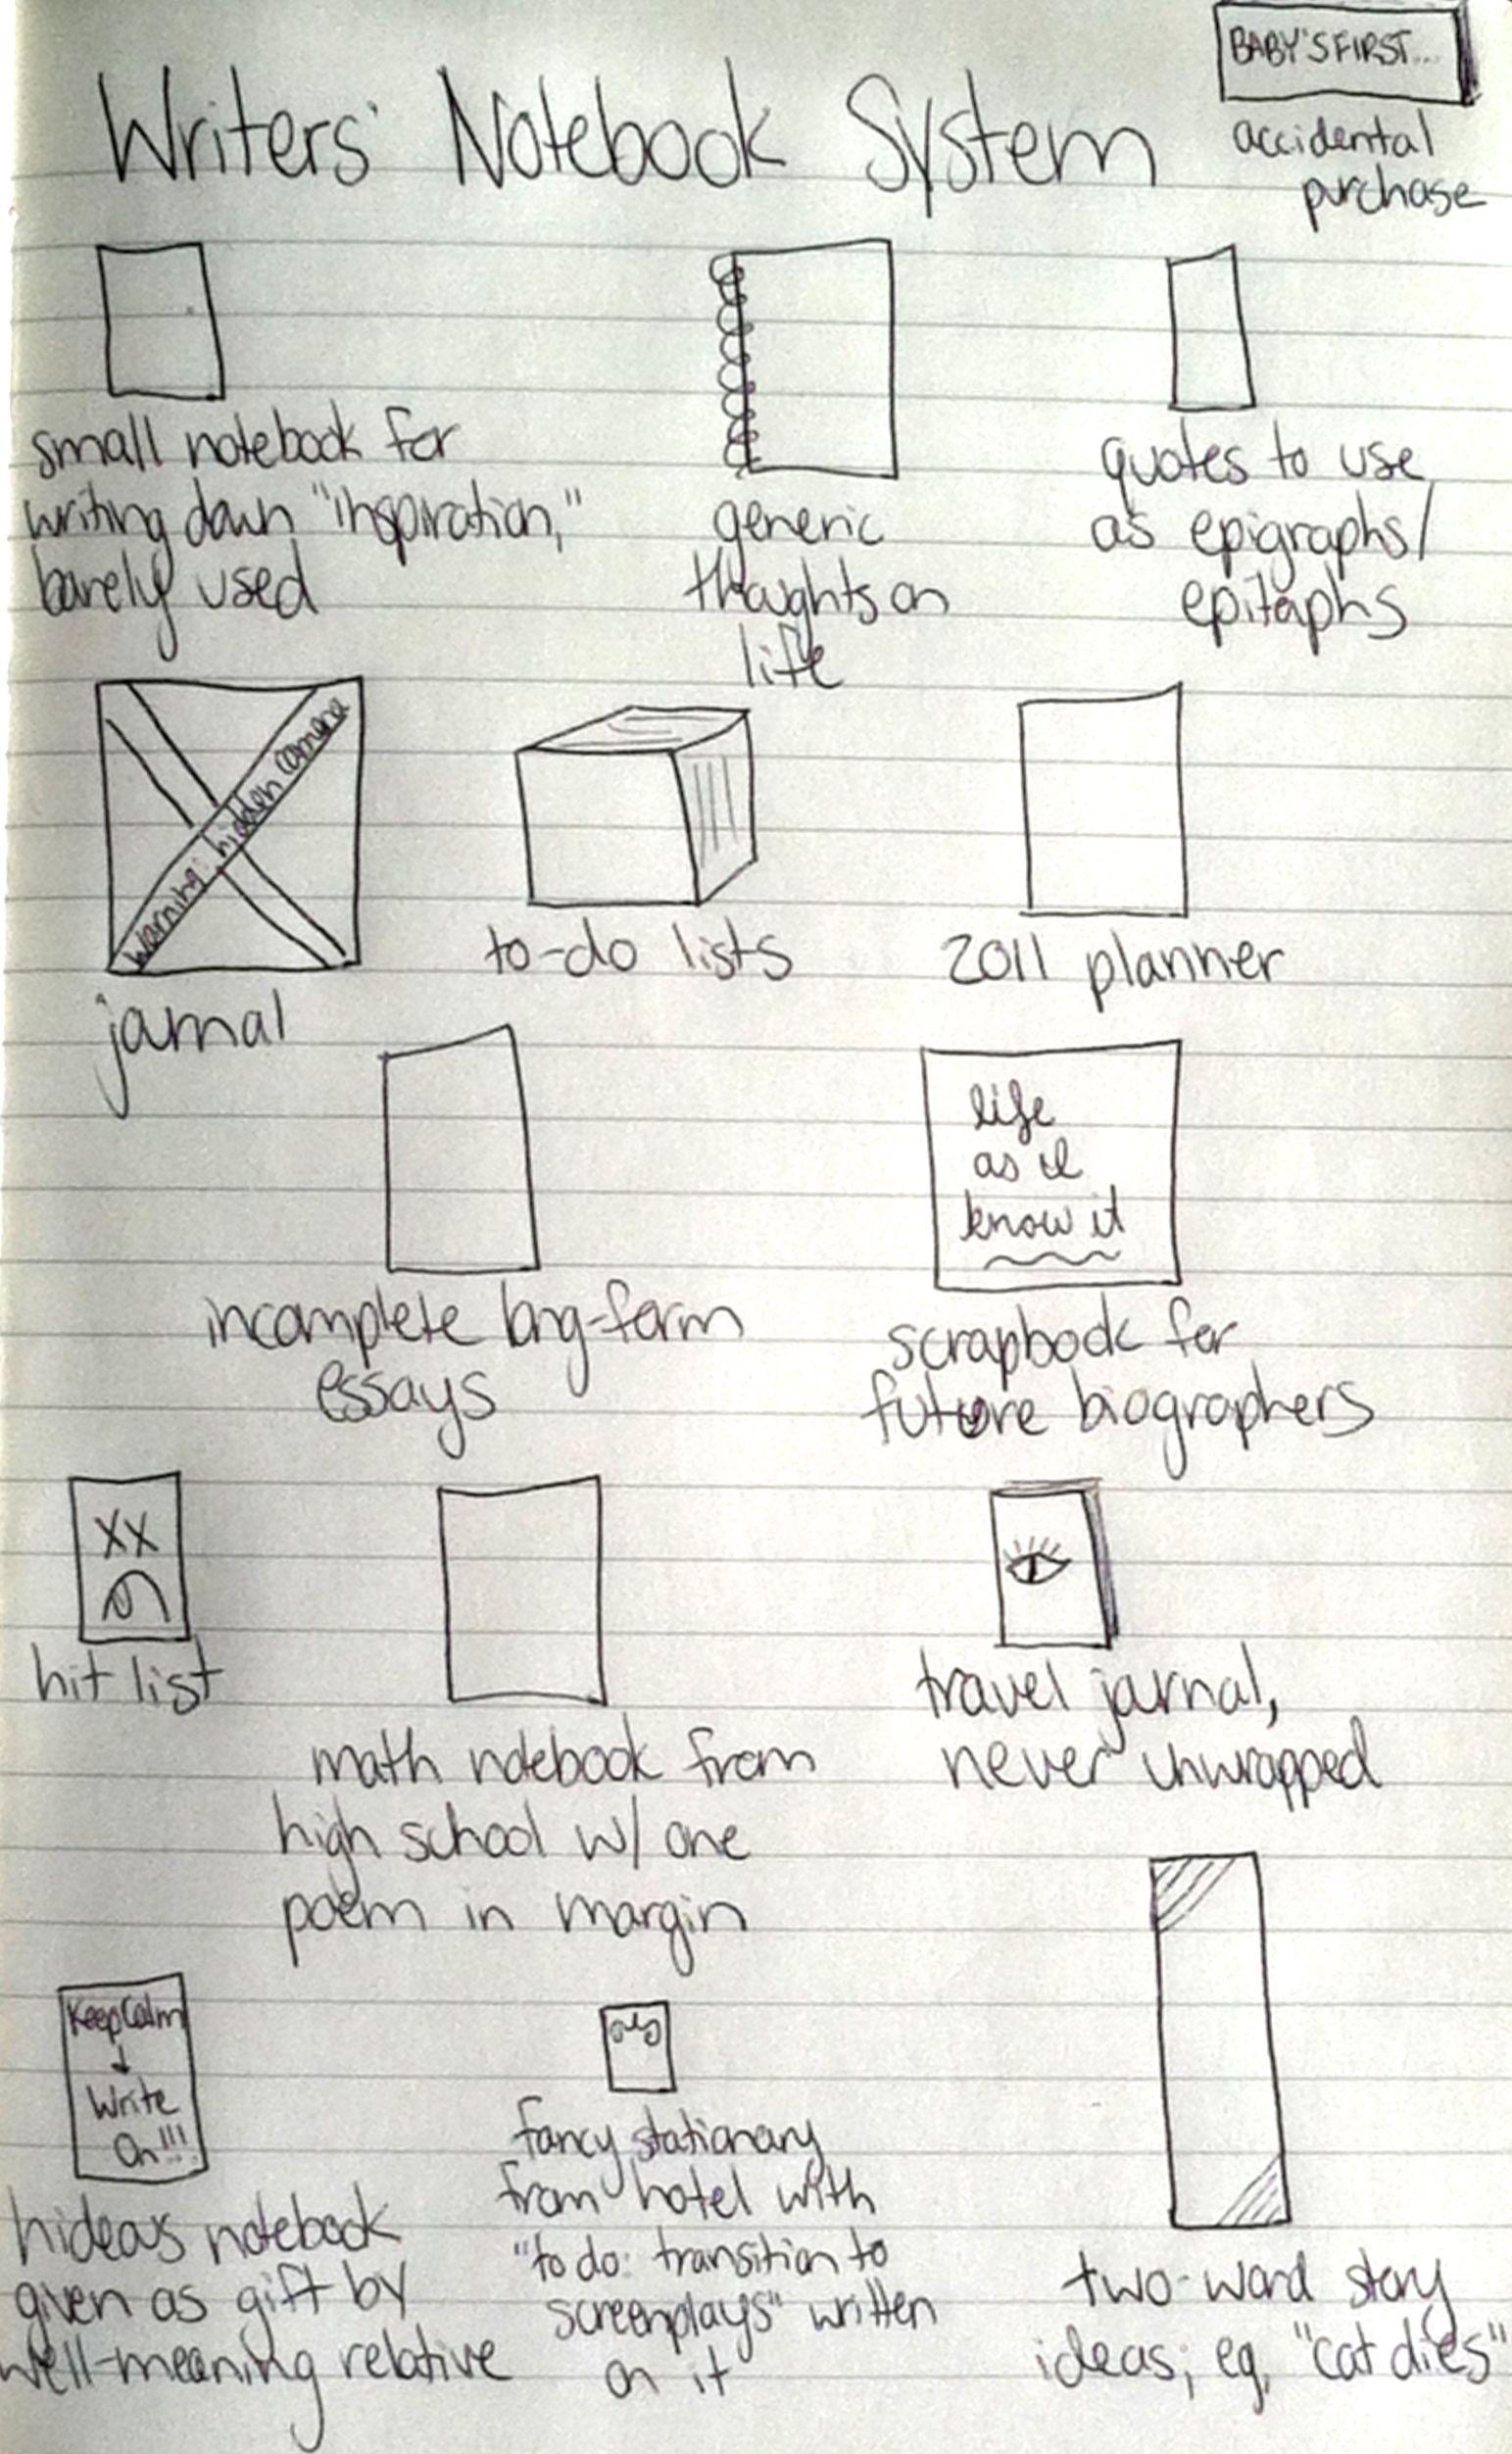 writersnotebooksystem